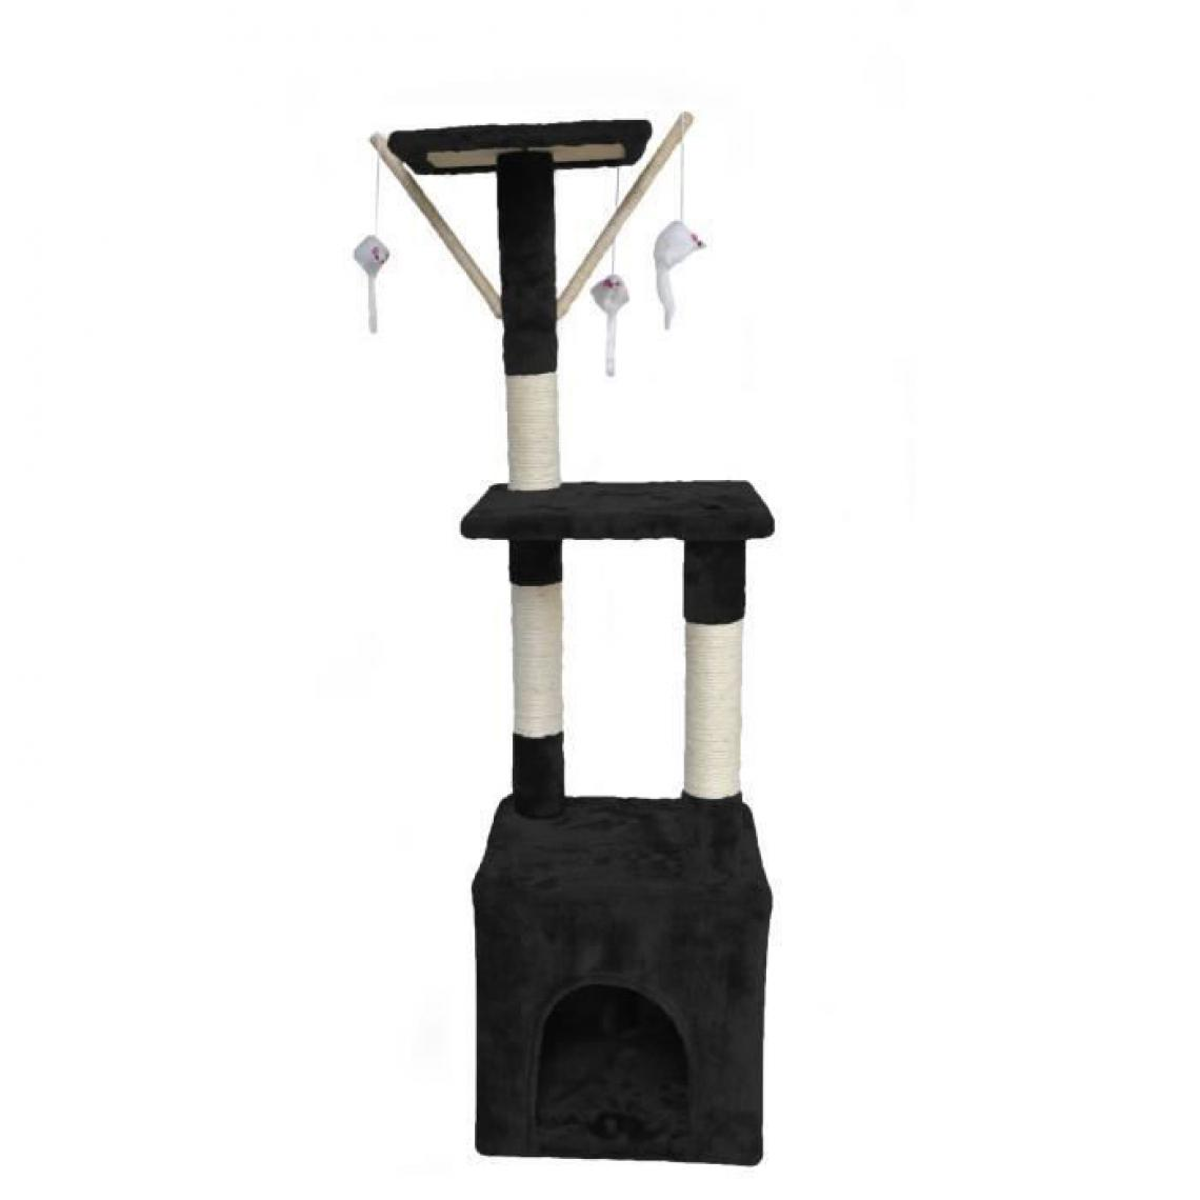 Poils And Plumes POILS + PLUMES Arbre a chat OMalley - 30 x 30 x 110 cm - Noir